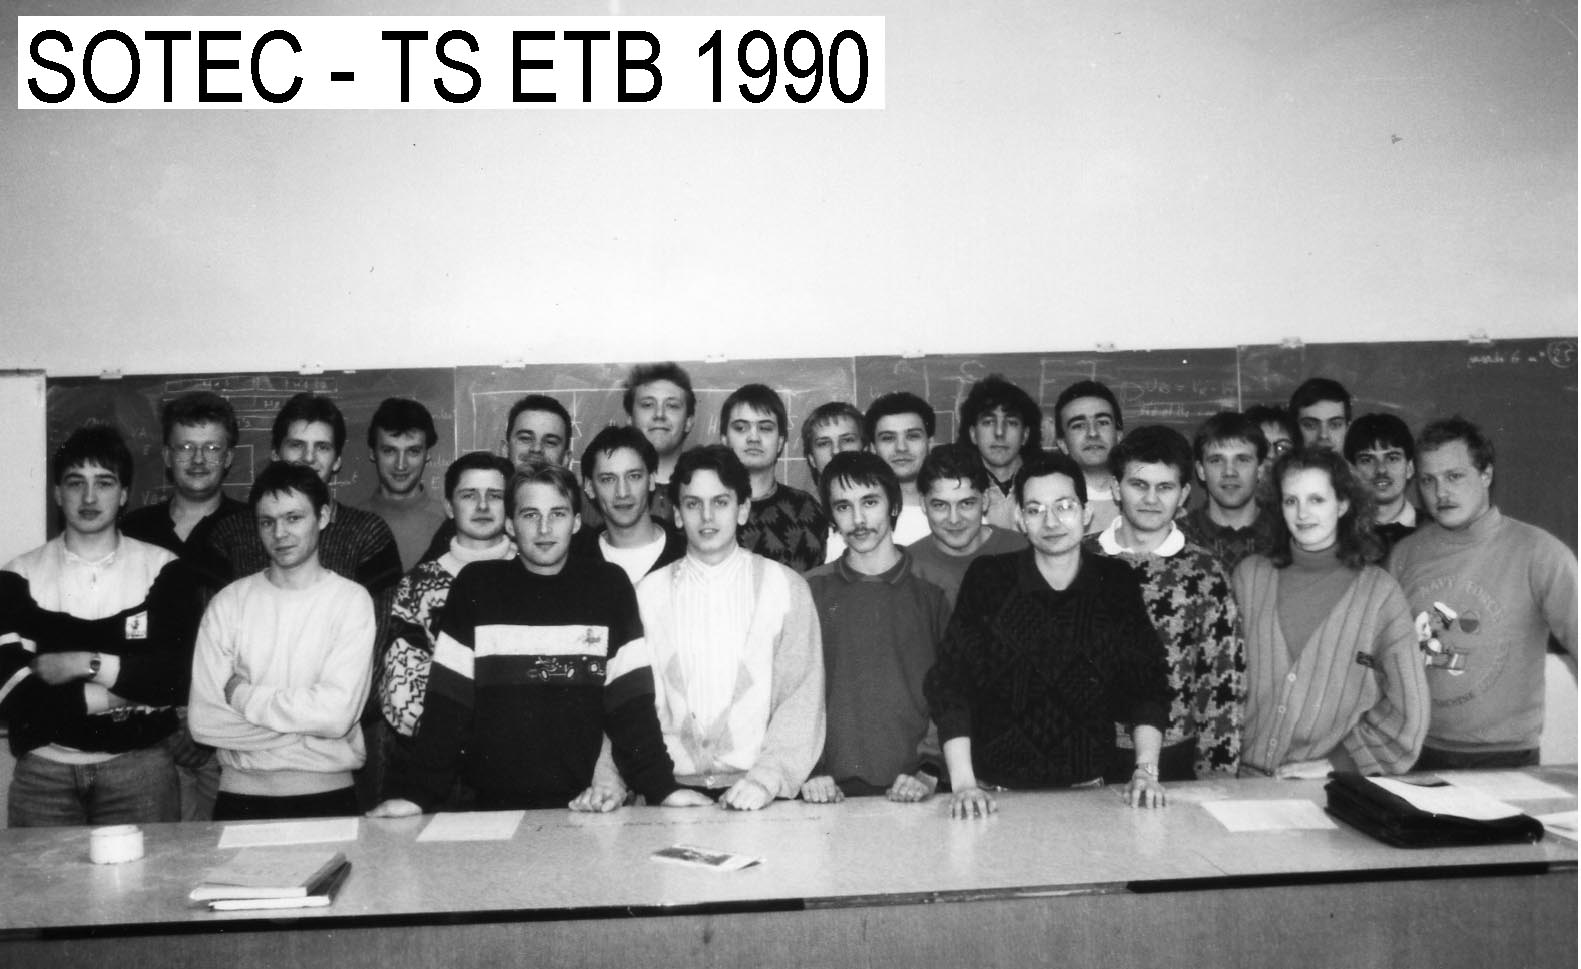 TS_ETB_90.jpg